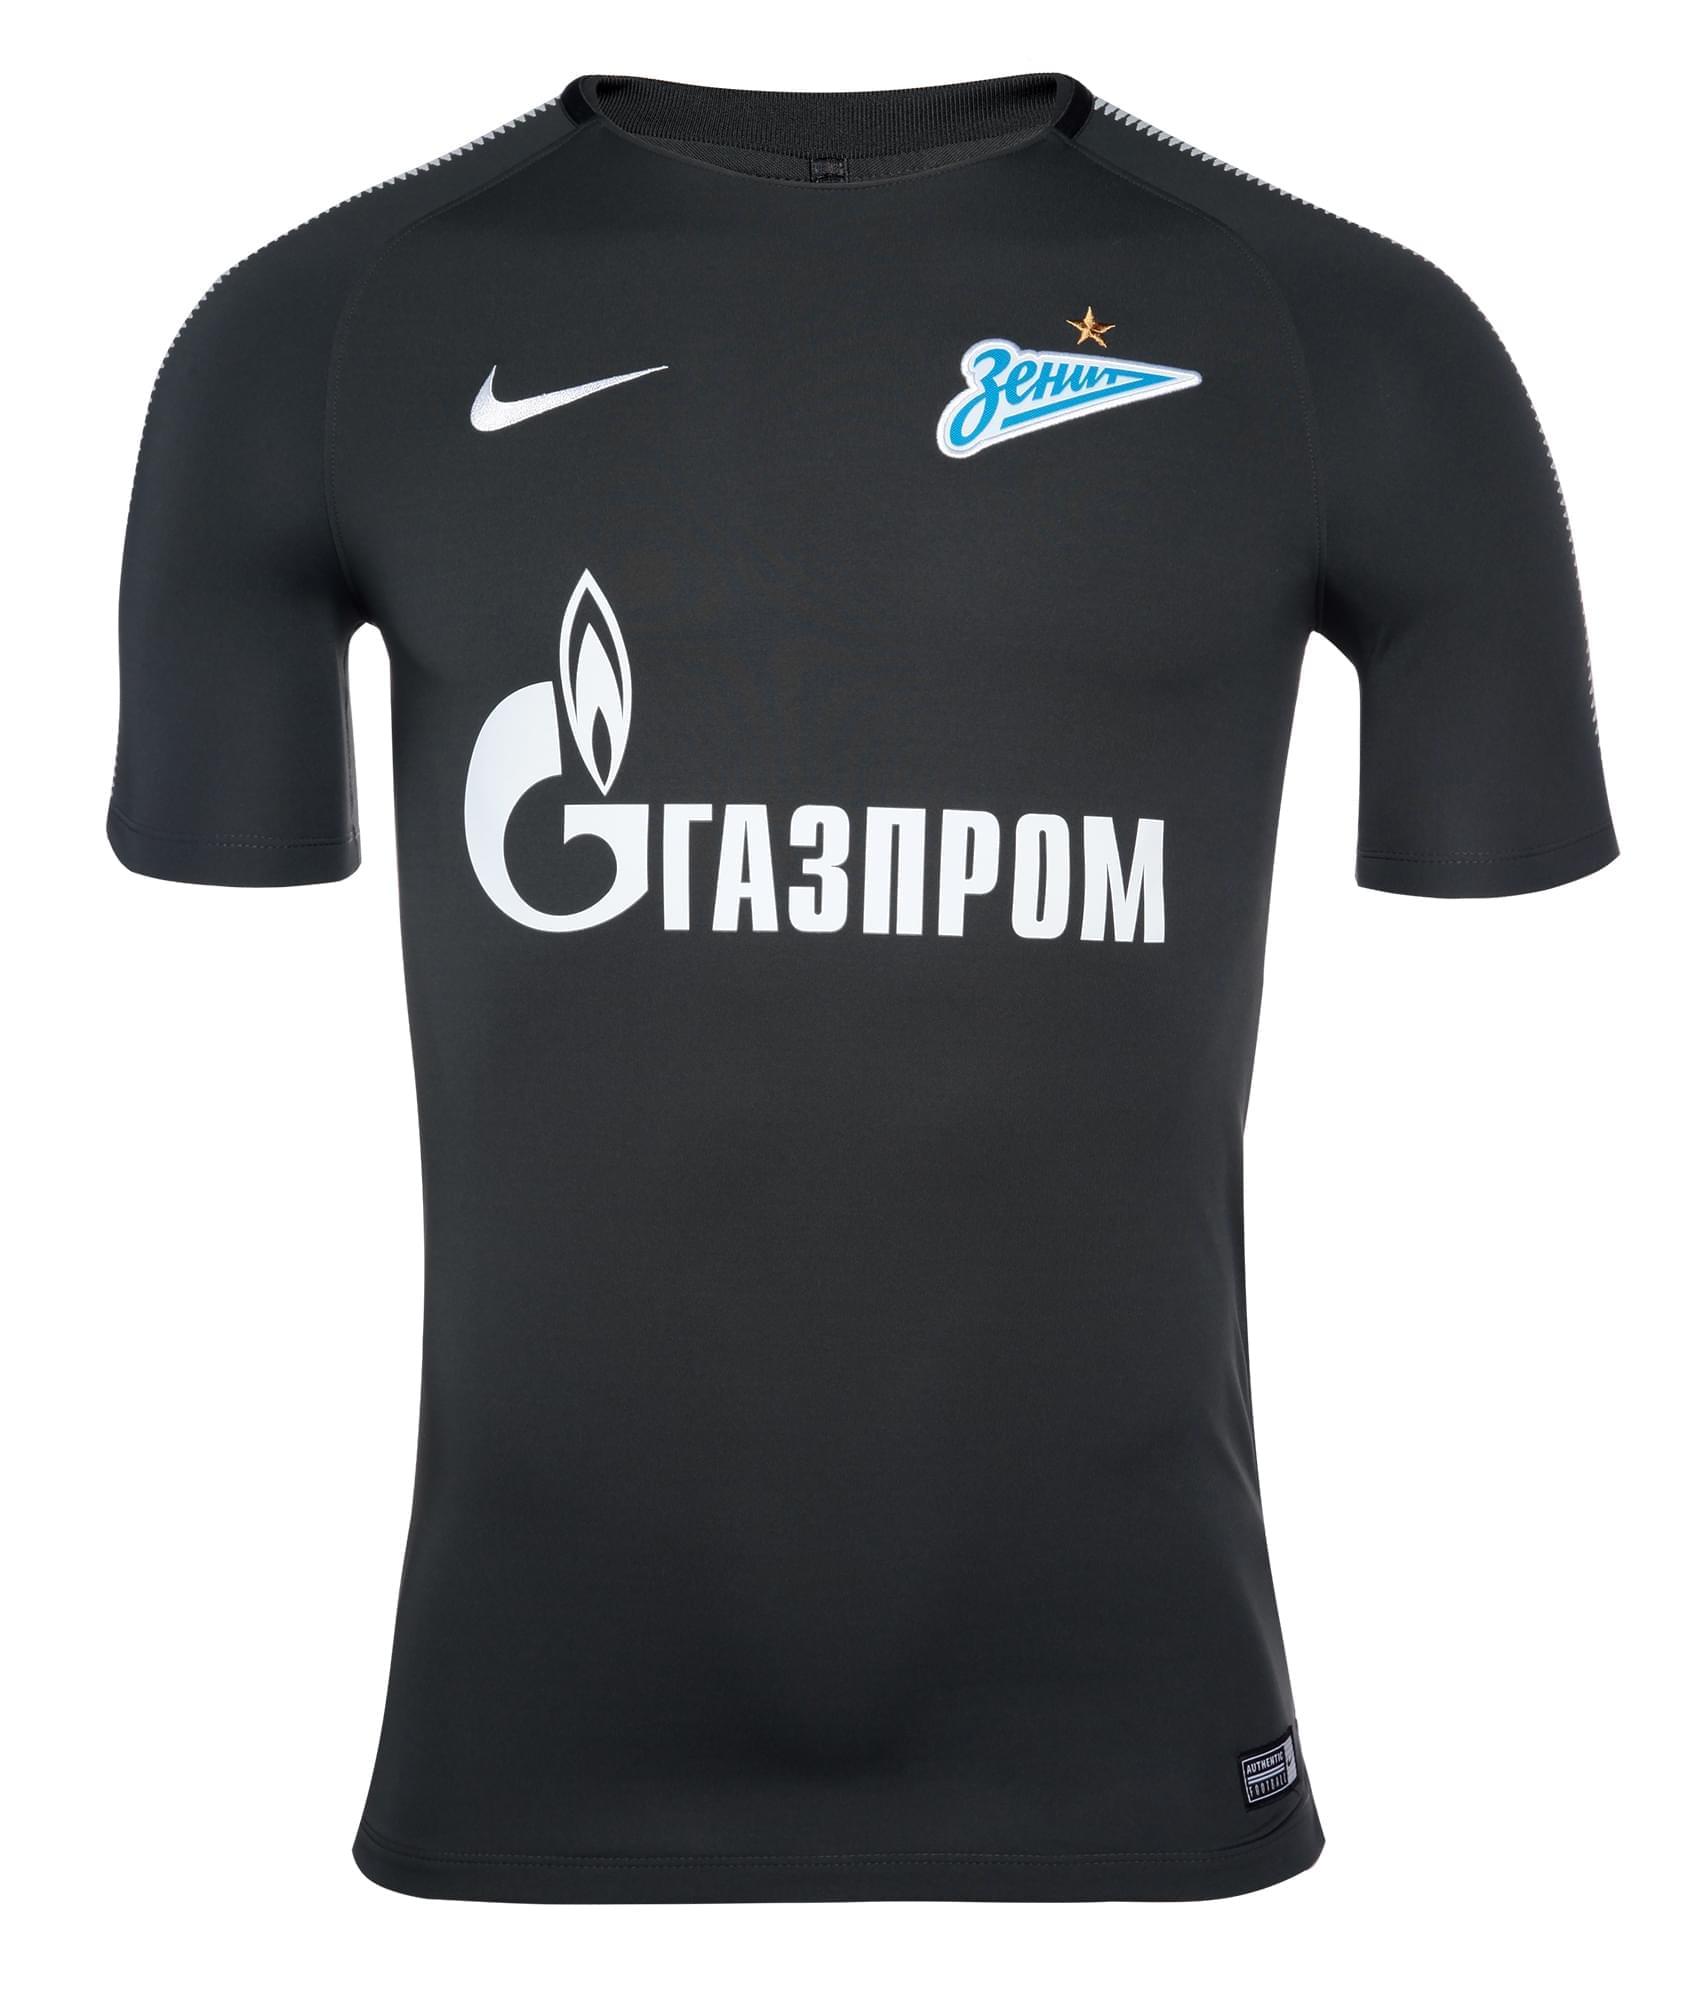 Футболка тренировочная Nike, Цвет-Темно-Серый, Размер-XL футболка женская diesel цвет темно серый 00ssun 0wady размер xl 50